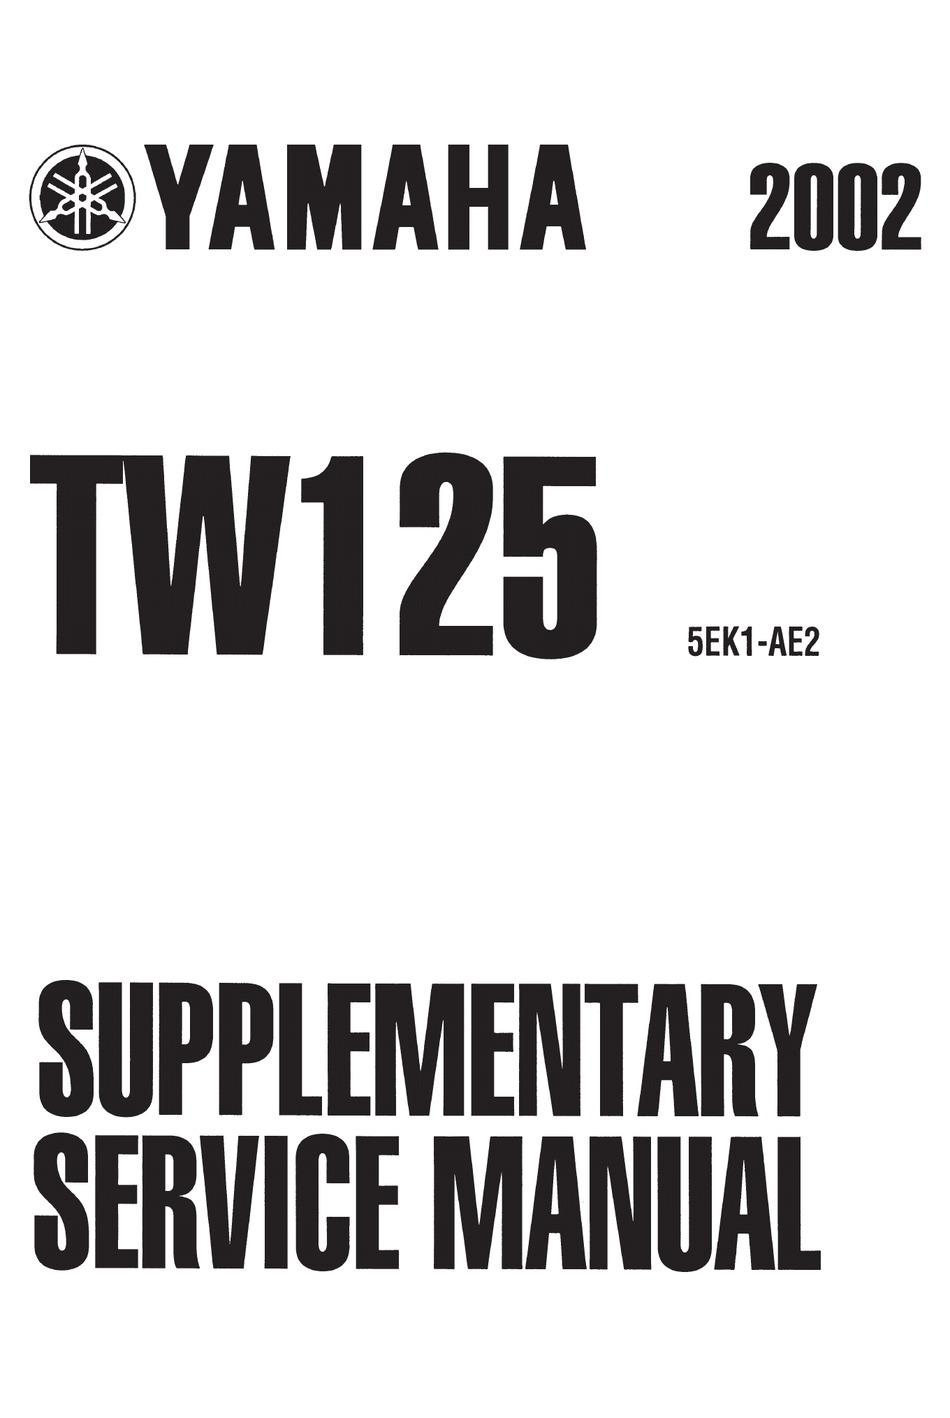 YAMAHA 2002 TW125 SUPPLEMENTARY SERVICE MANUAL Pdf